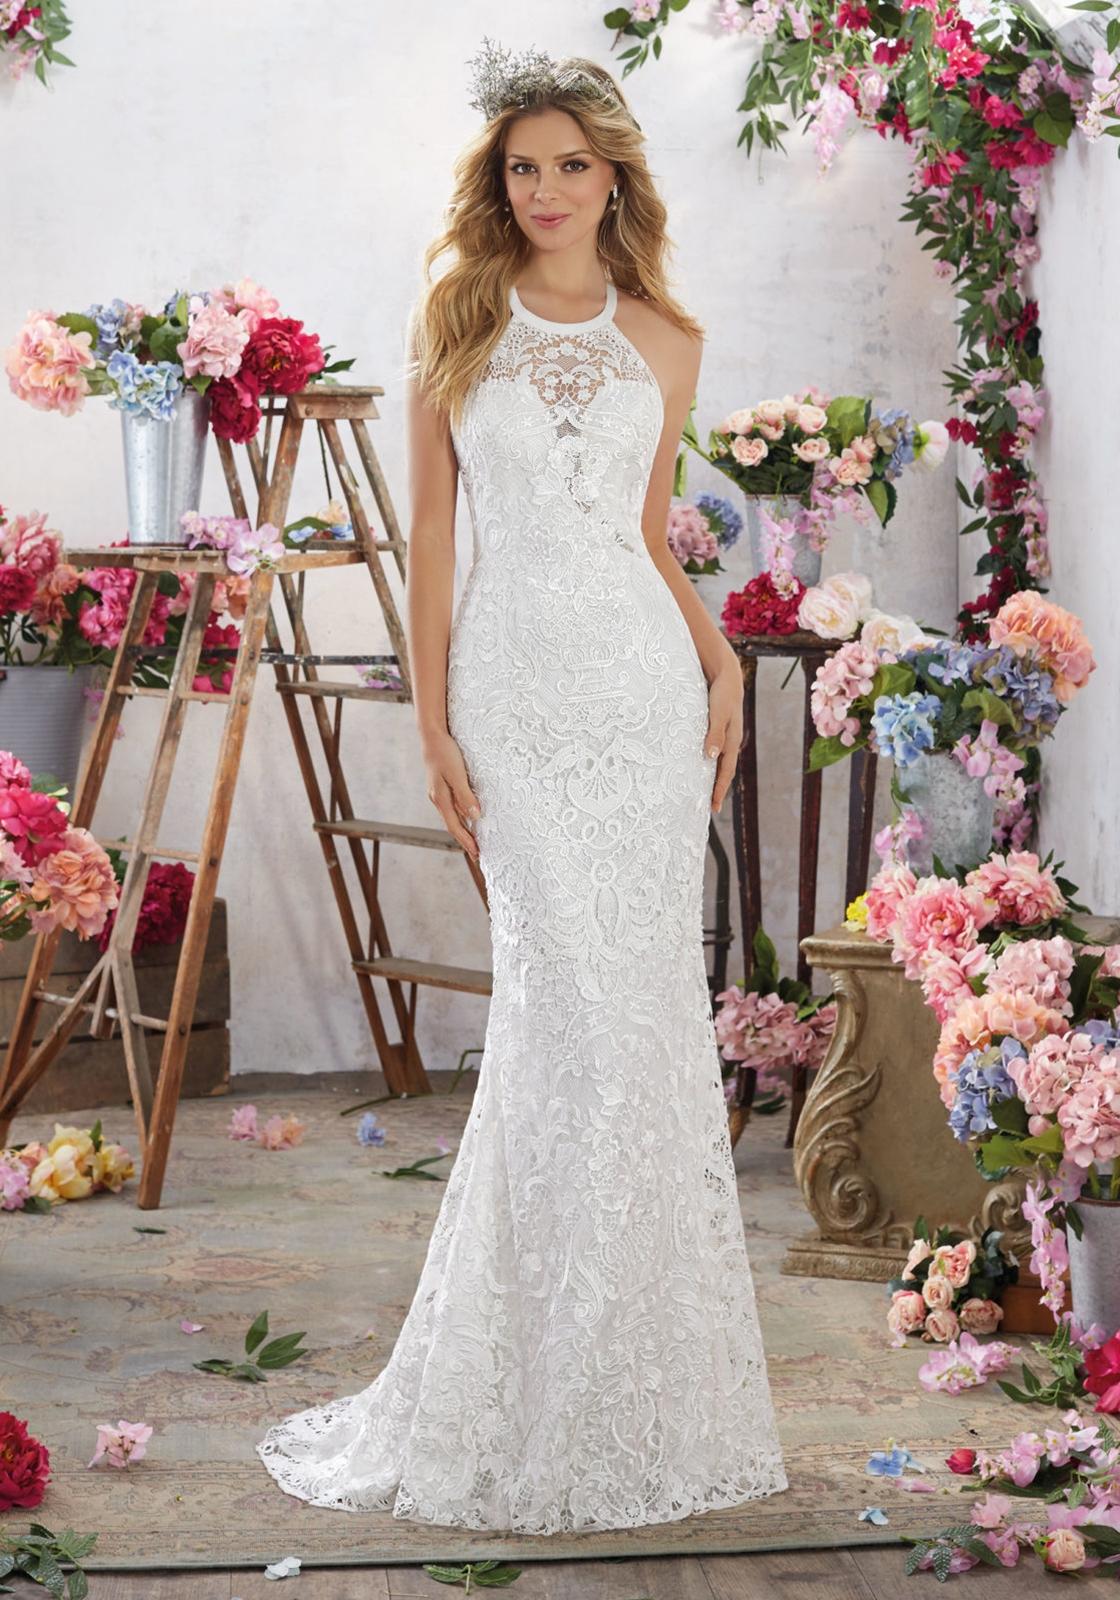 elizabeth james wedding dresses » Wedding Dresses Designs, Ideas and ...